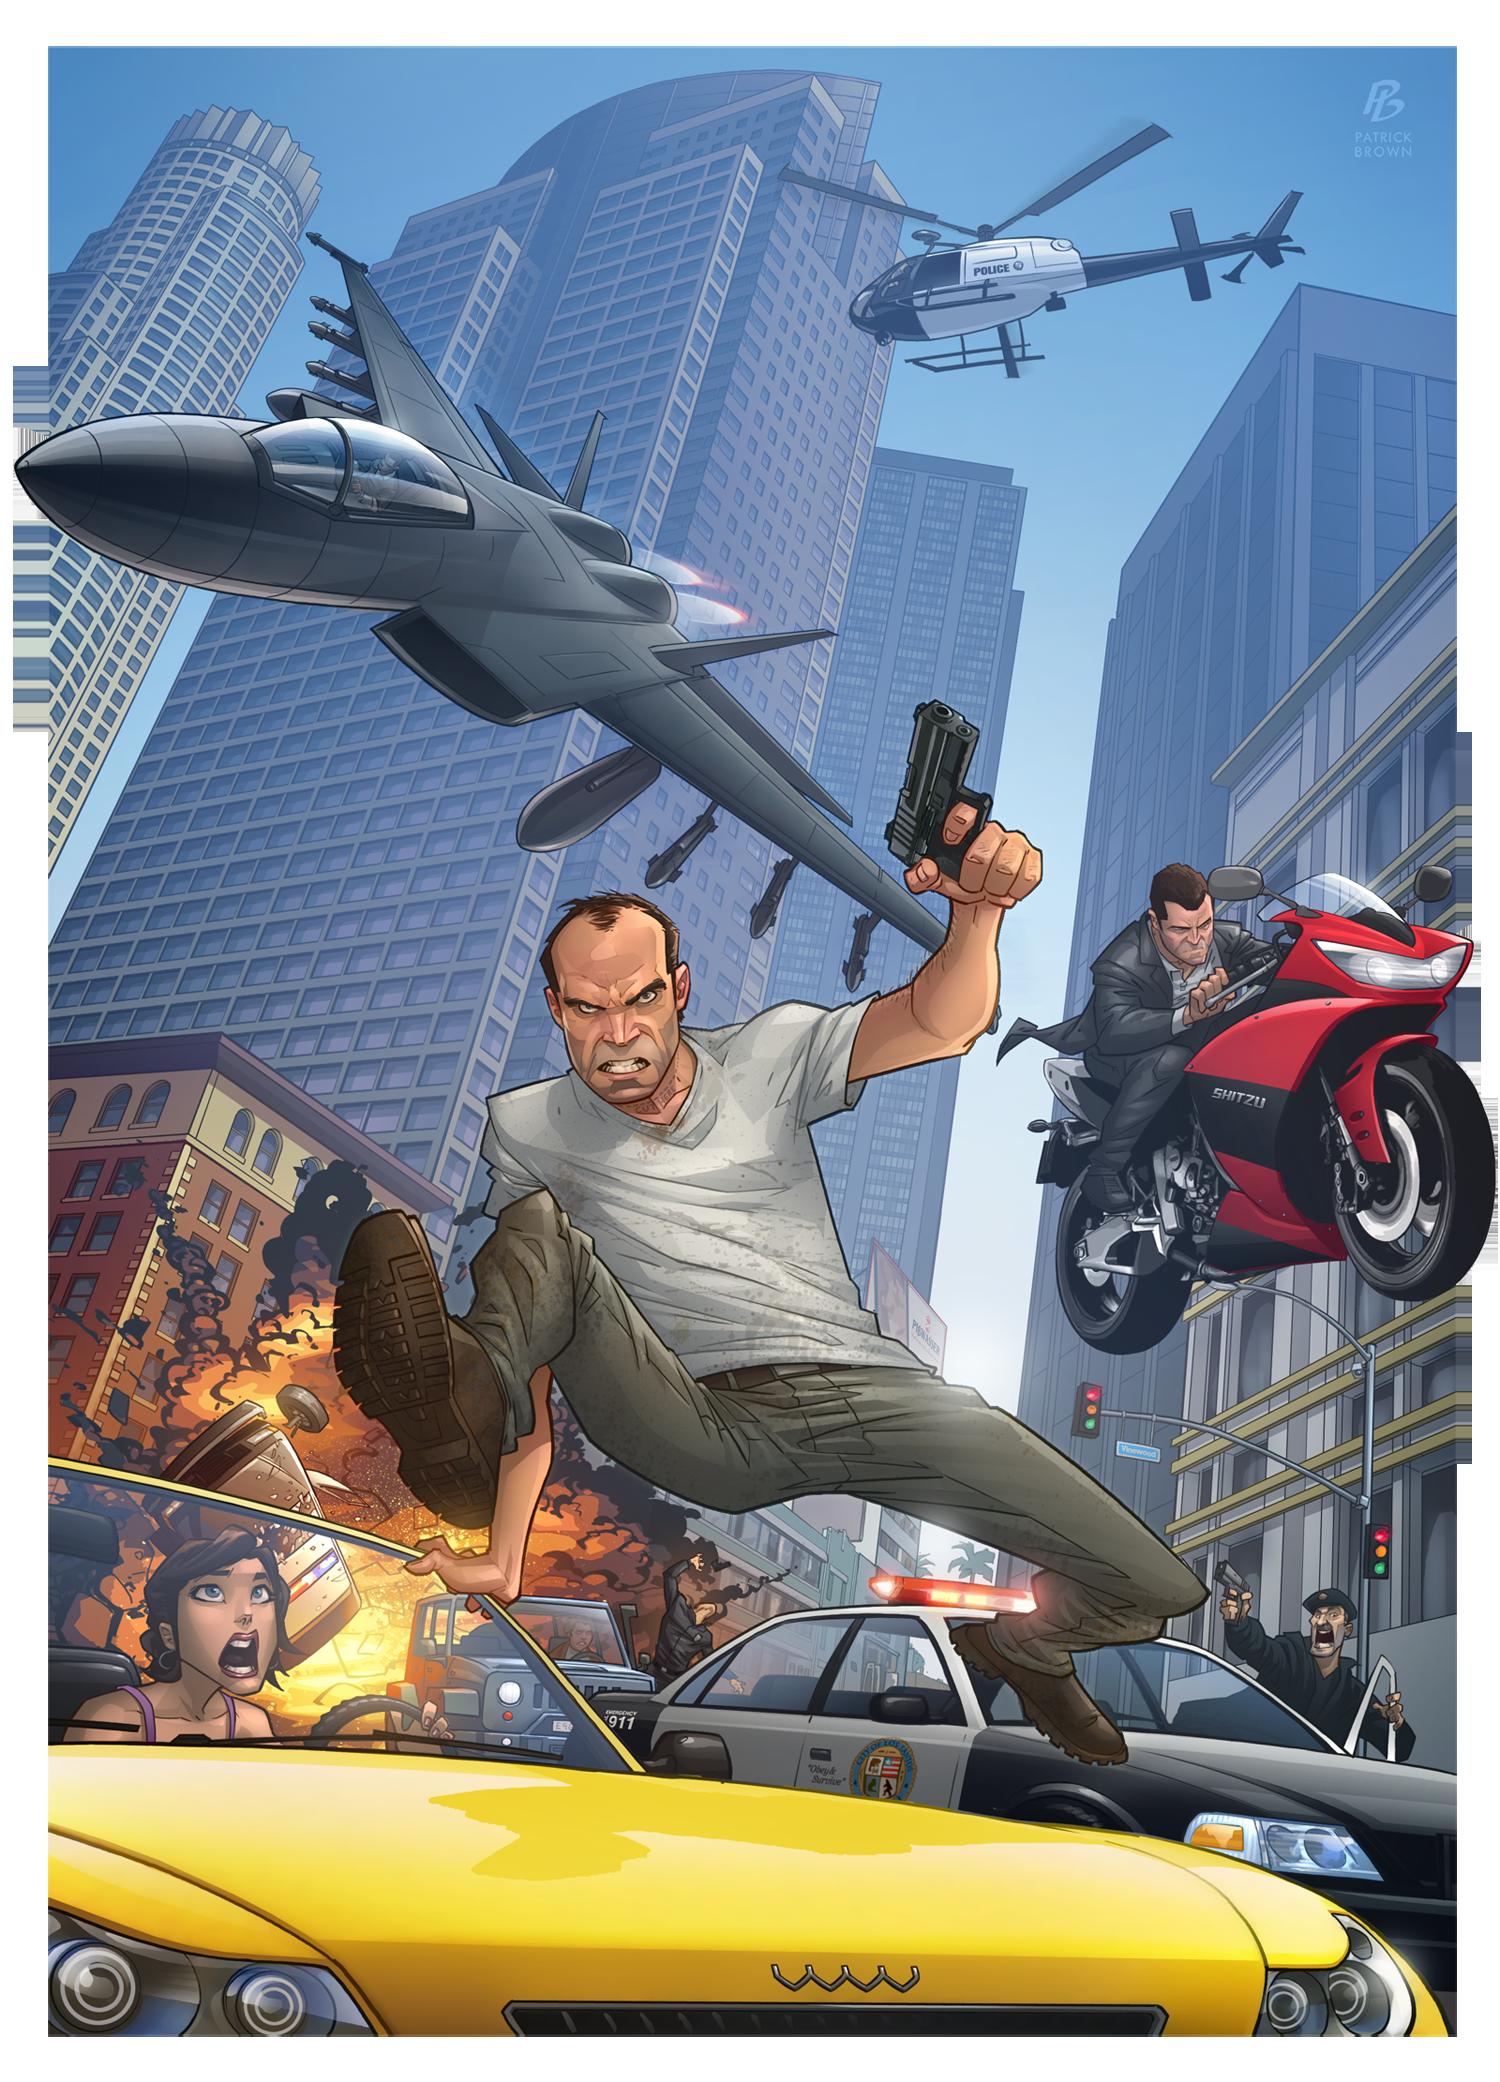 d79f4315cdde15 Patrick Brown Grand Theft Auto V Fan Art